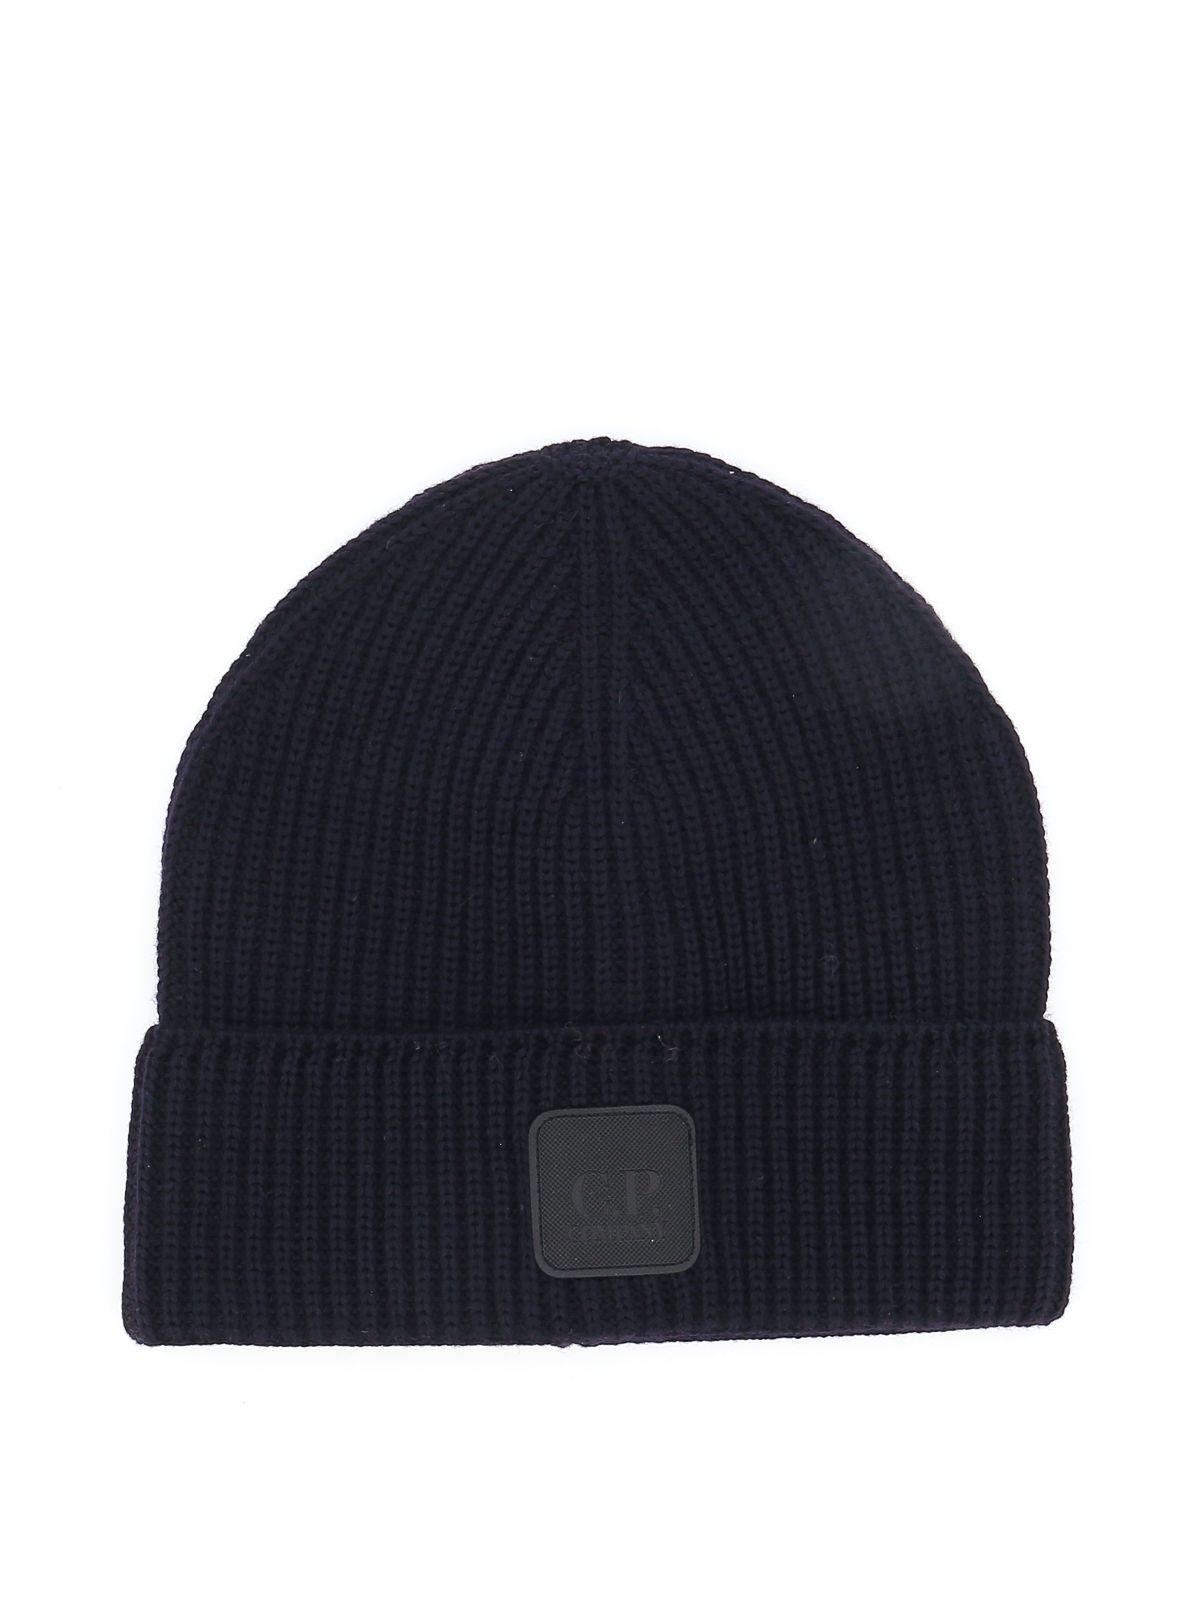 C.p. Company CP COMPANY MEN'S BLUE WOOL HAT